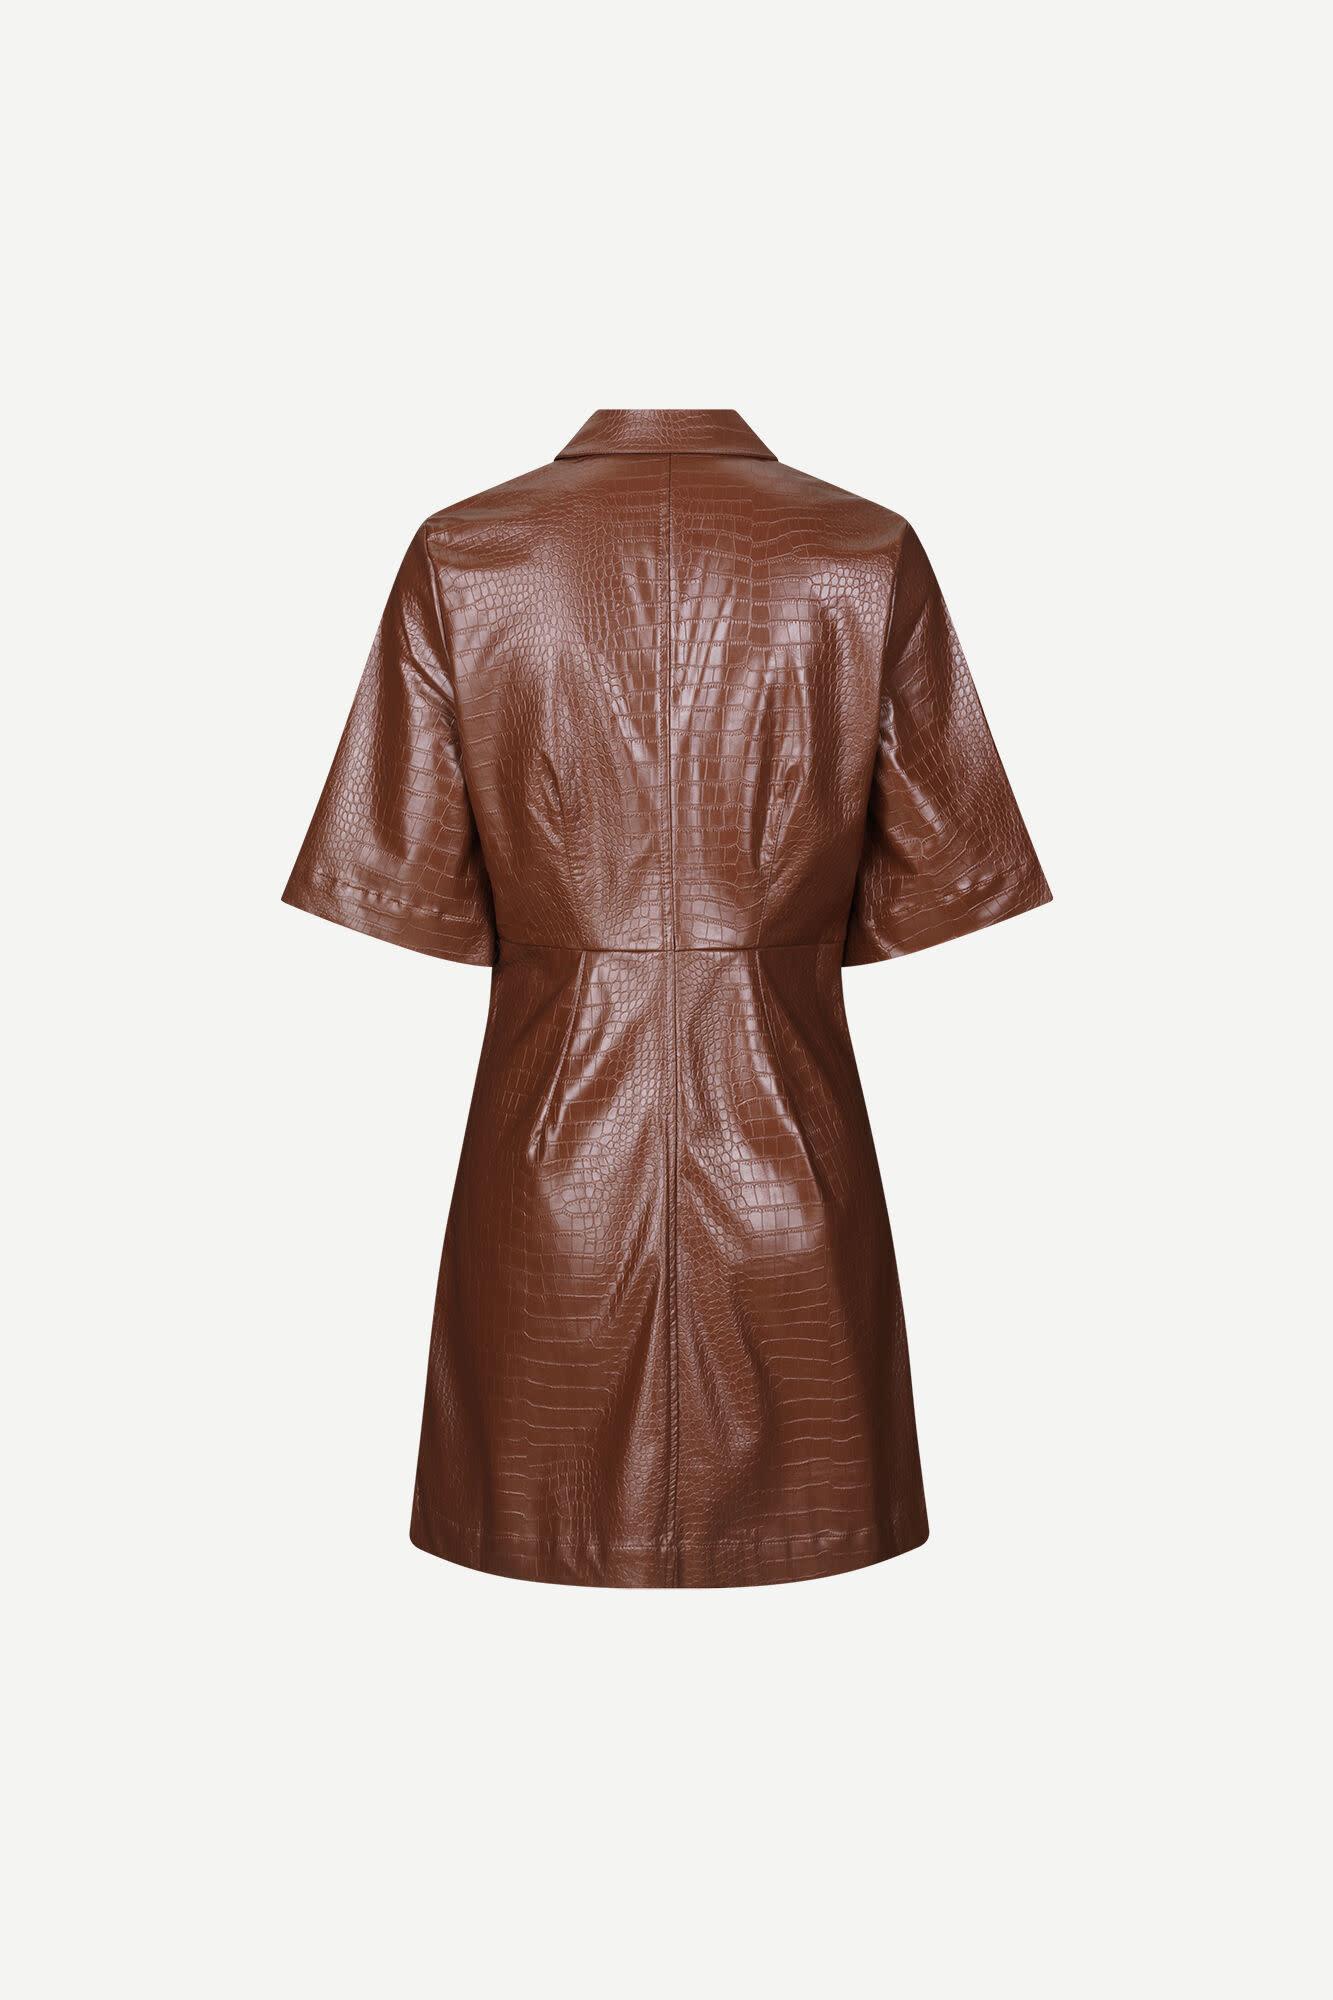 Myla Faux Leather Dress Chocolate Brown-2